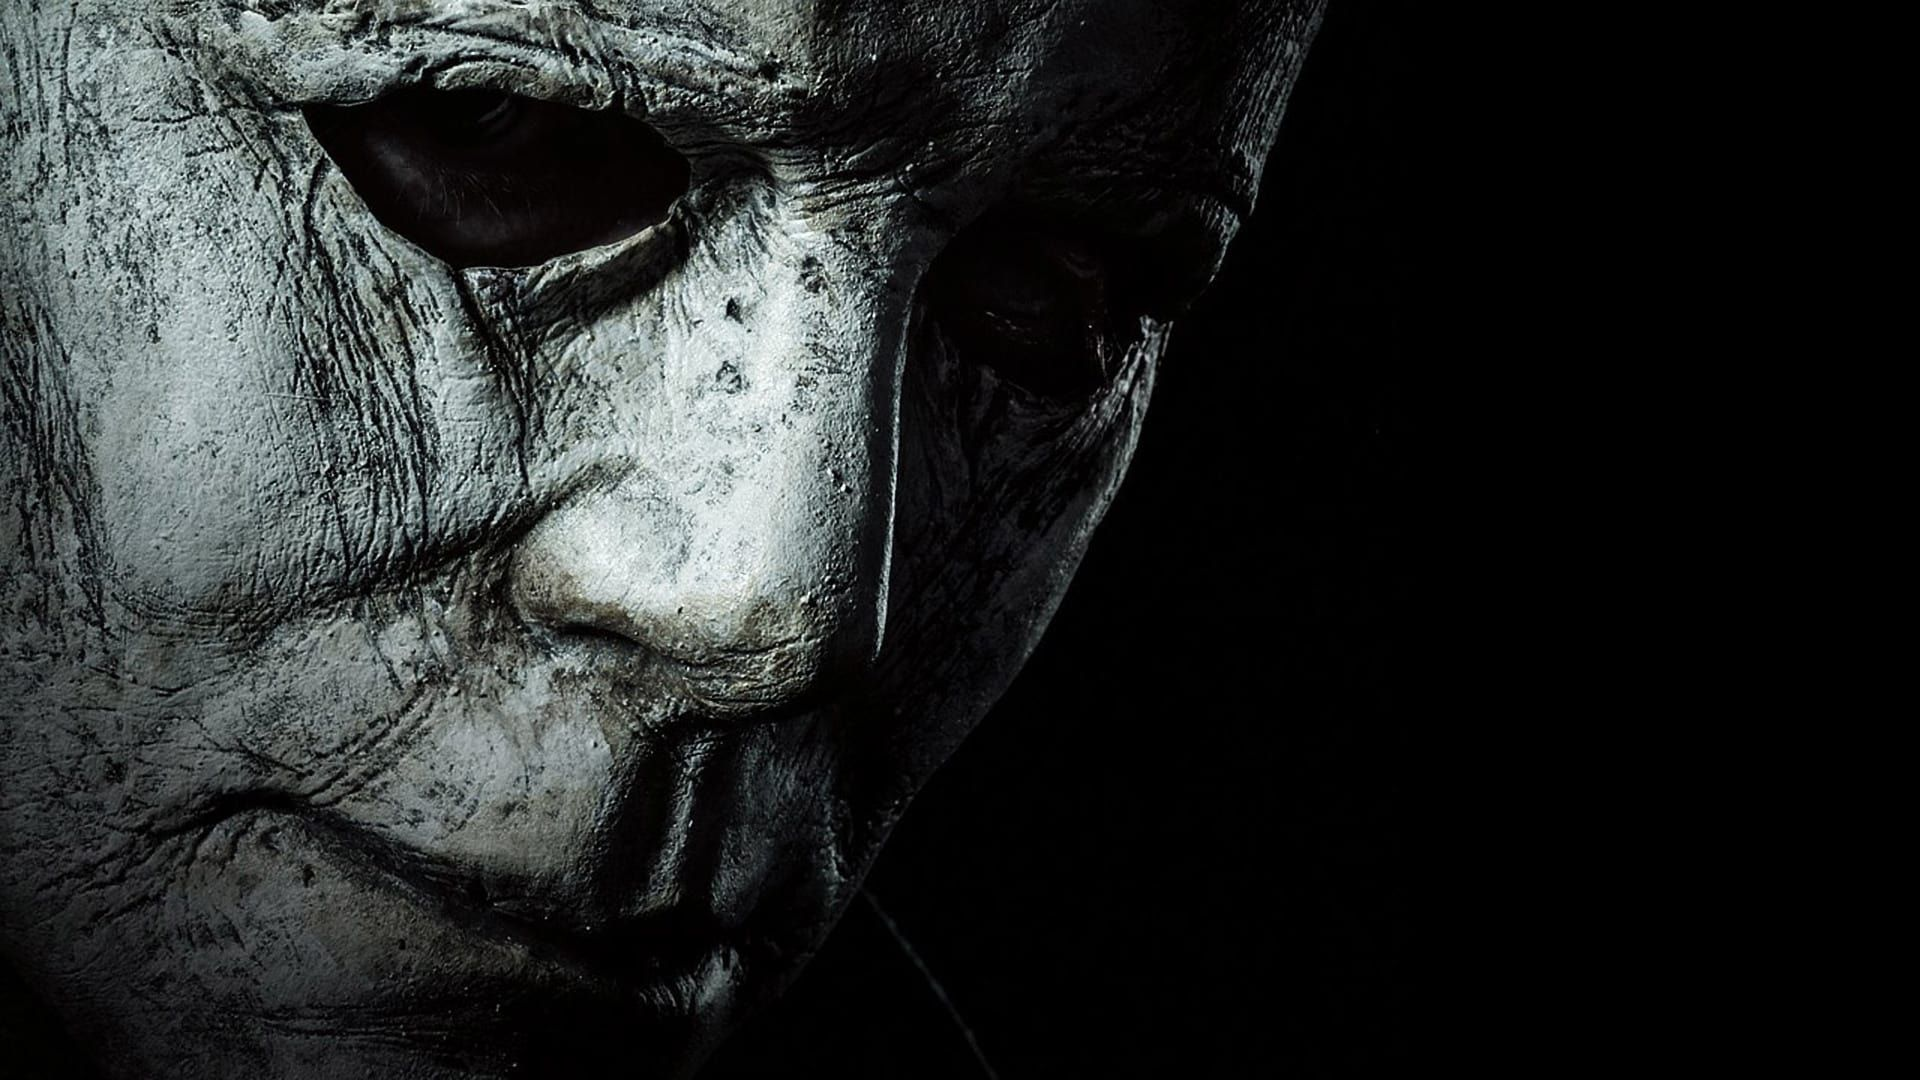 Halloween Film Complet Halloween Film Complet Streaming Vf Halloween Film Complet Vf 2018 Halloween Film Com Halloween 2018 Halloween Franchise Slasher Film